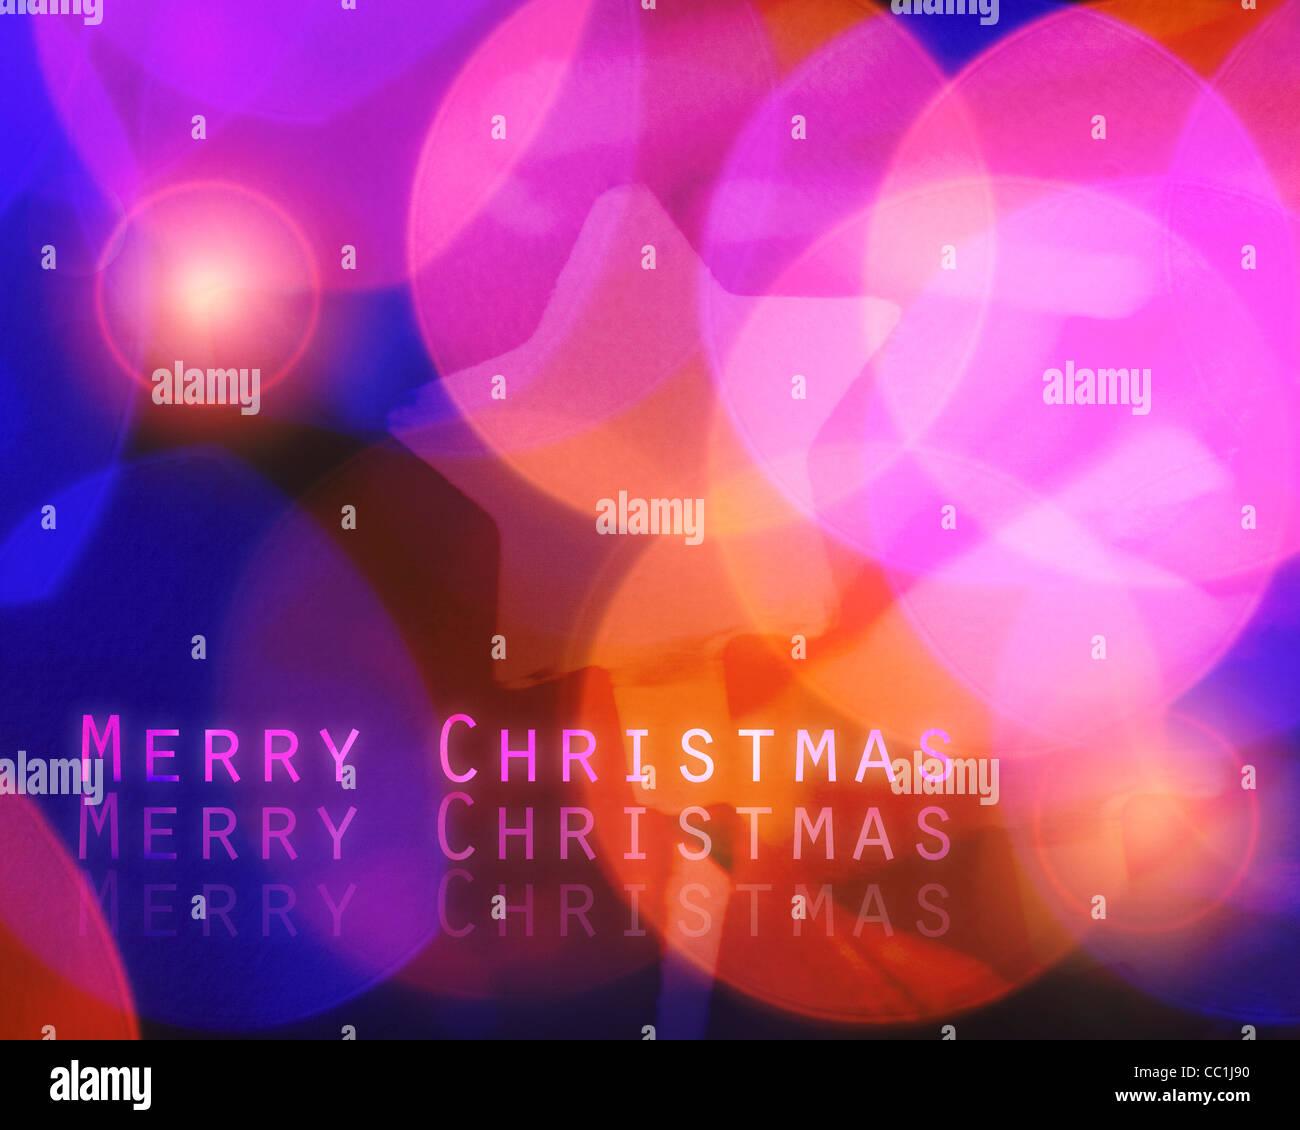 CONCEPT DE NOËL: Joyeux Noël Photo Stock